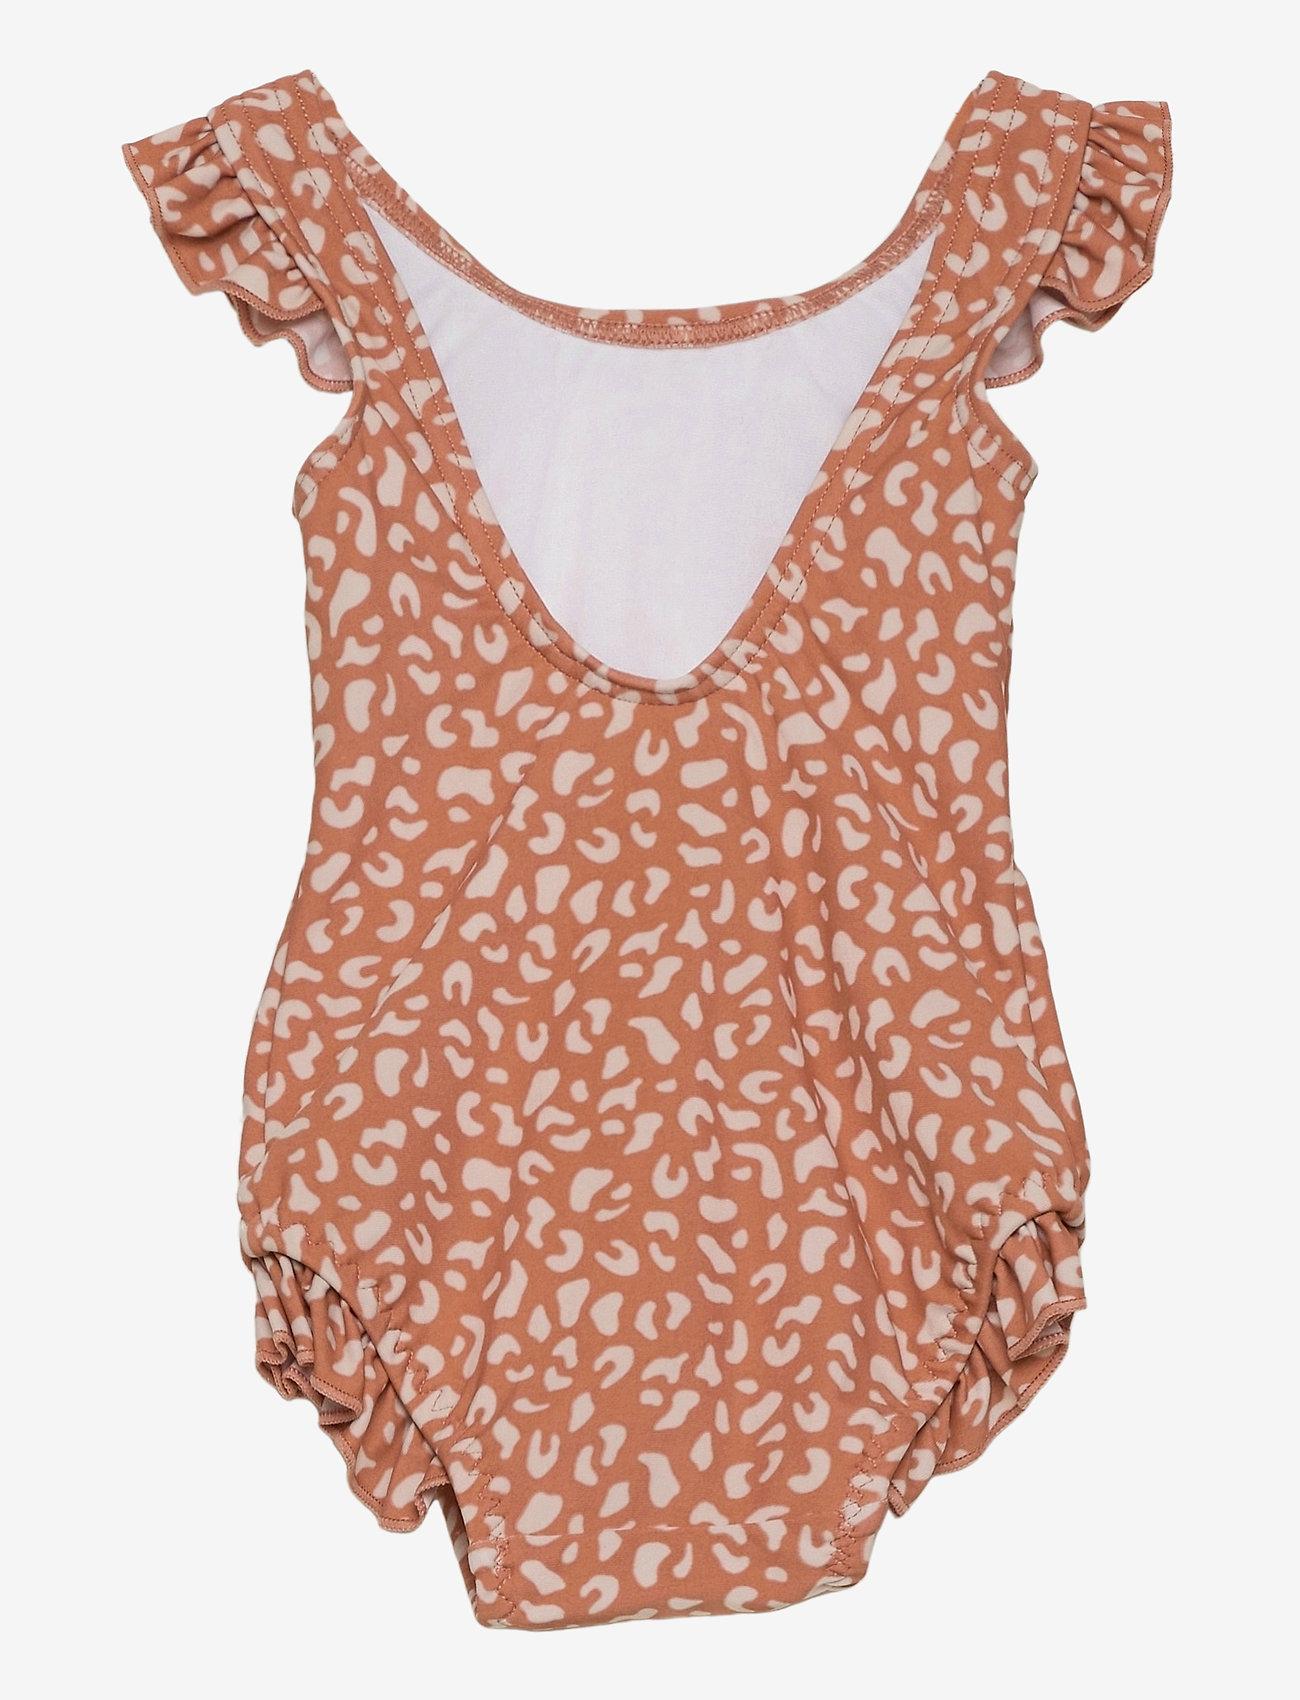 Liewood - Tanna swimsuit - swimsuits - mini leo tuscany rose - 1